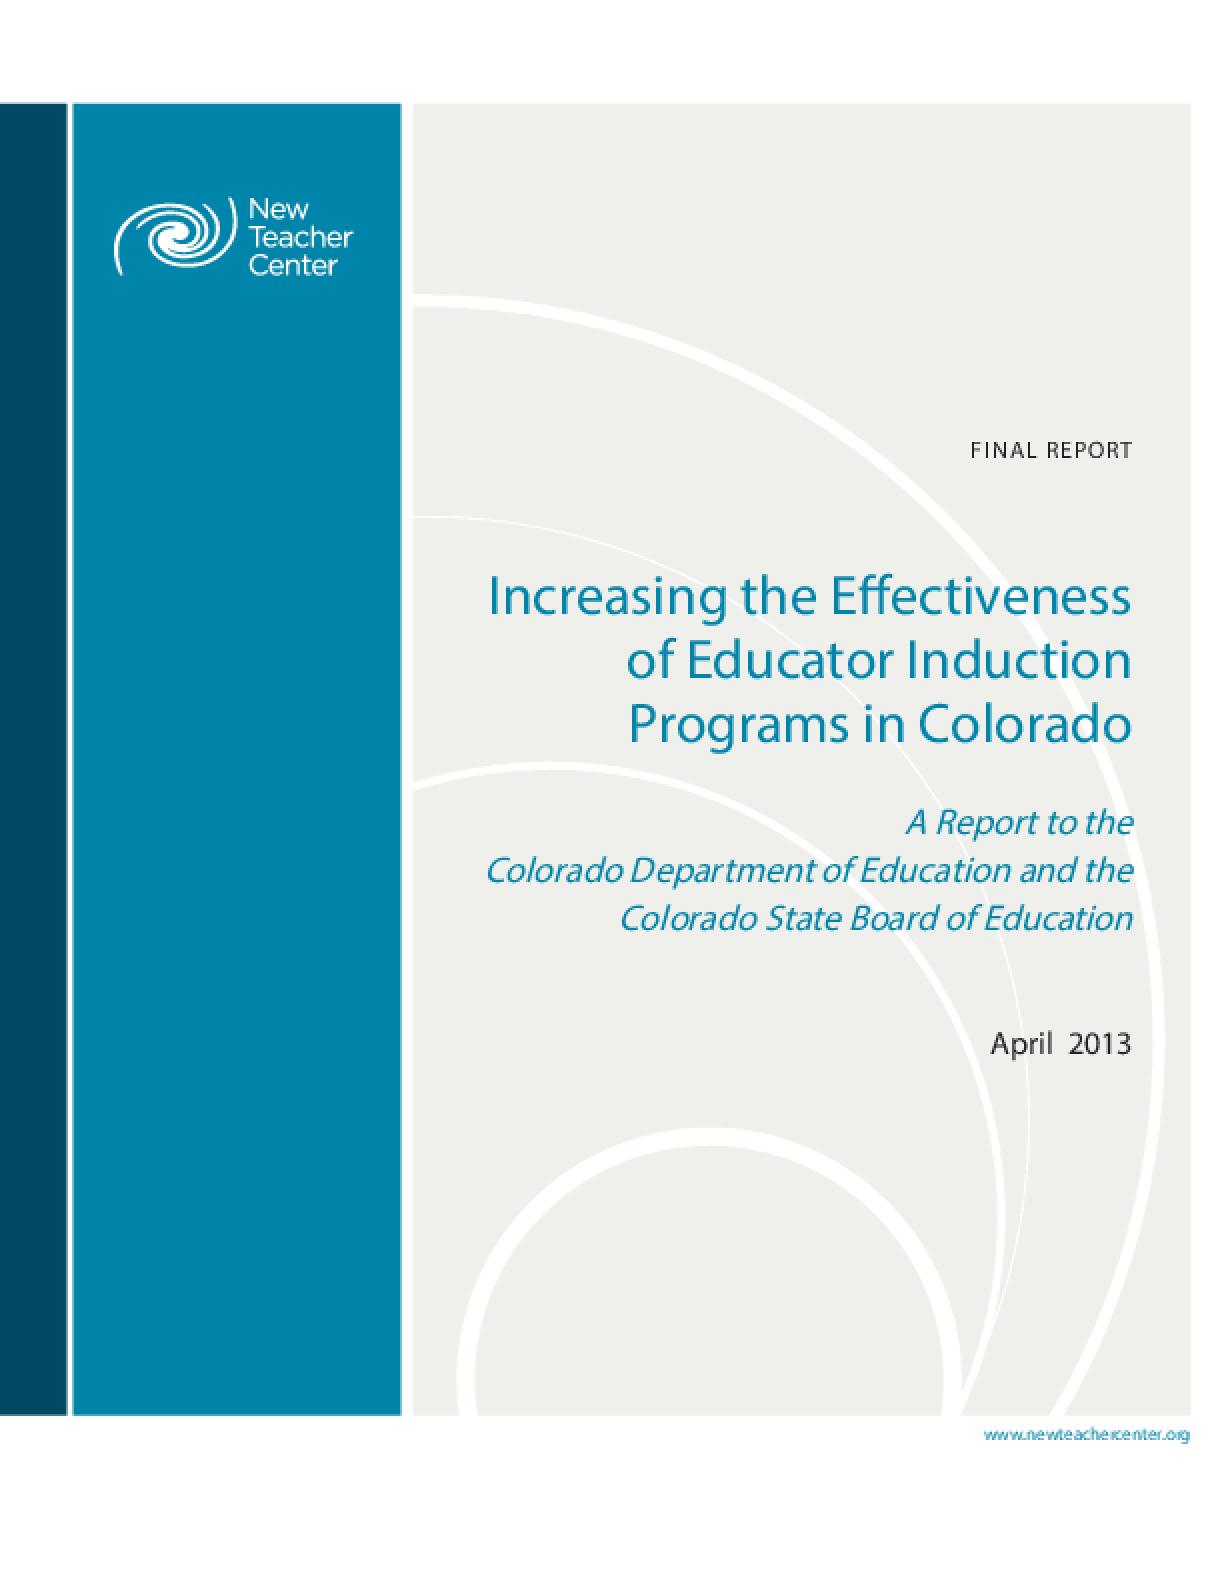 Increasing the Effectiveness of Educator Induction Programs in Colorado